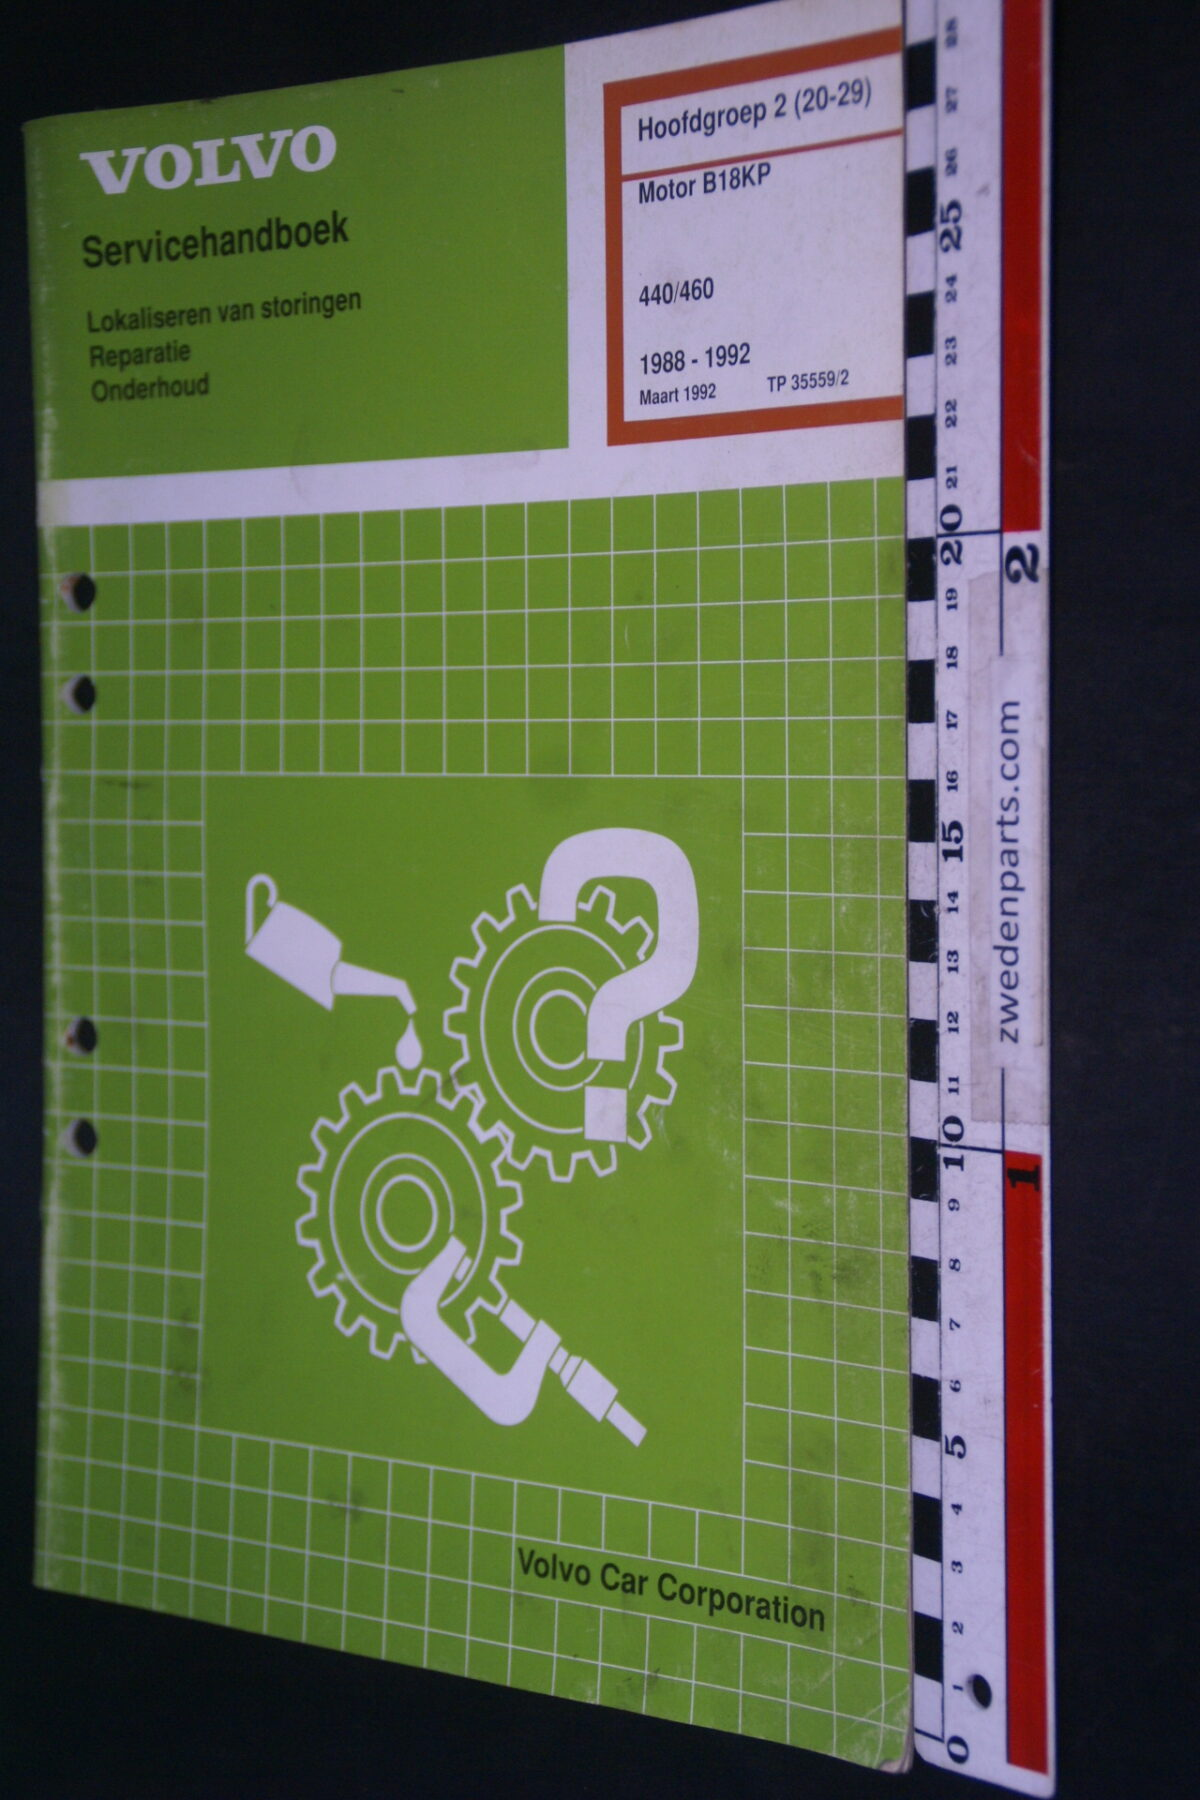 DSC09064 1992 origineel  Volvo 440 460 servicehandboek motor B18KP 2 (20-29) 1 van 1.000 nr TP 35559-2